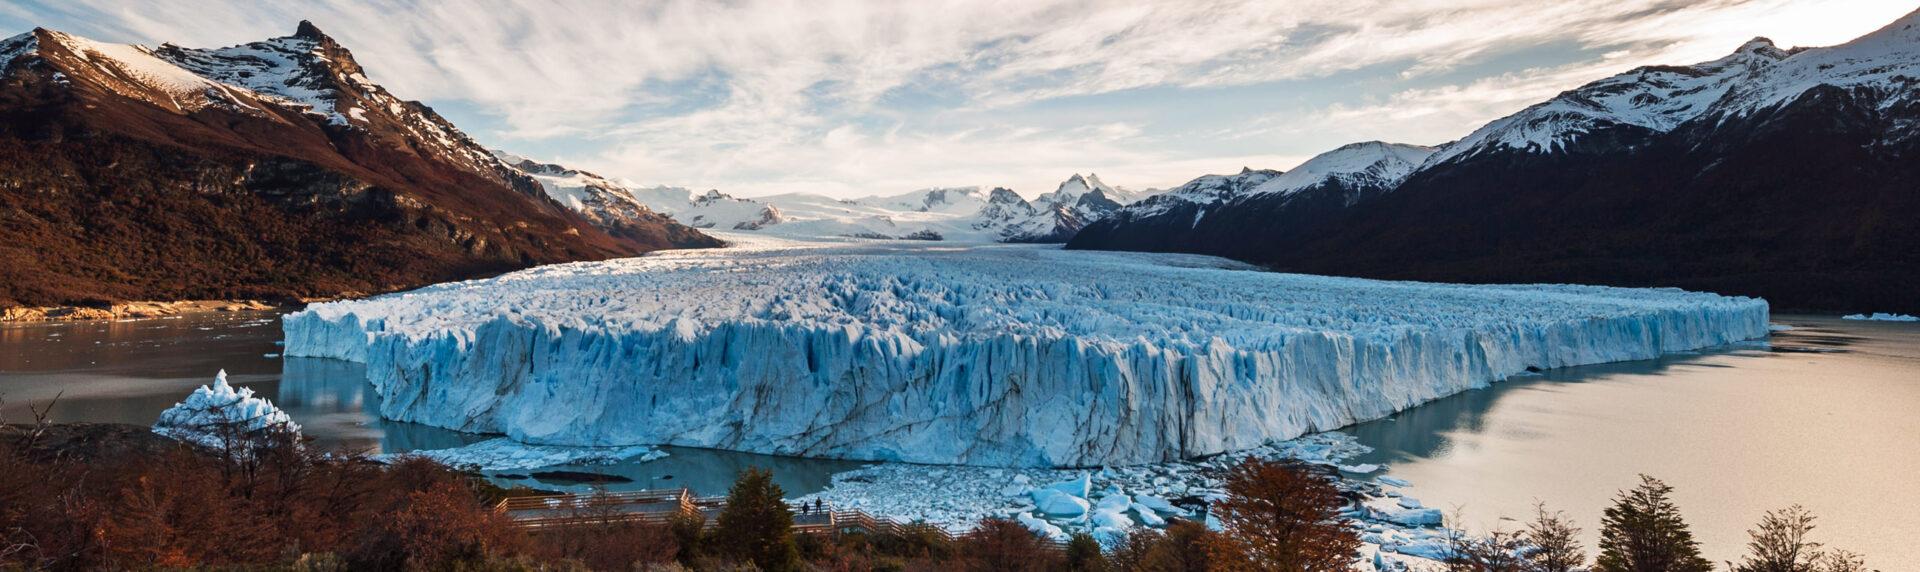 Patagonie Reizen Atacama Argentinie 26